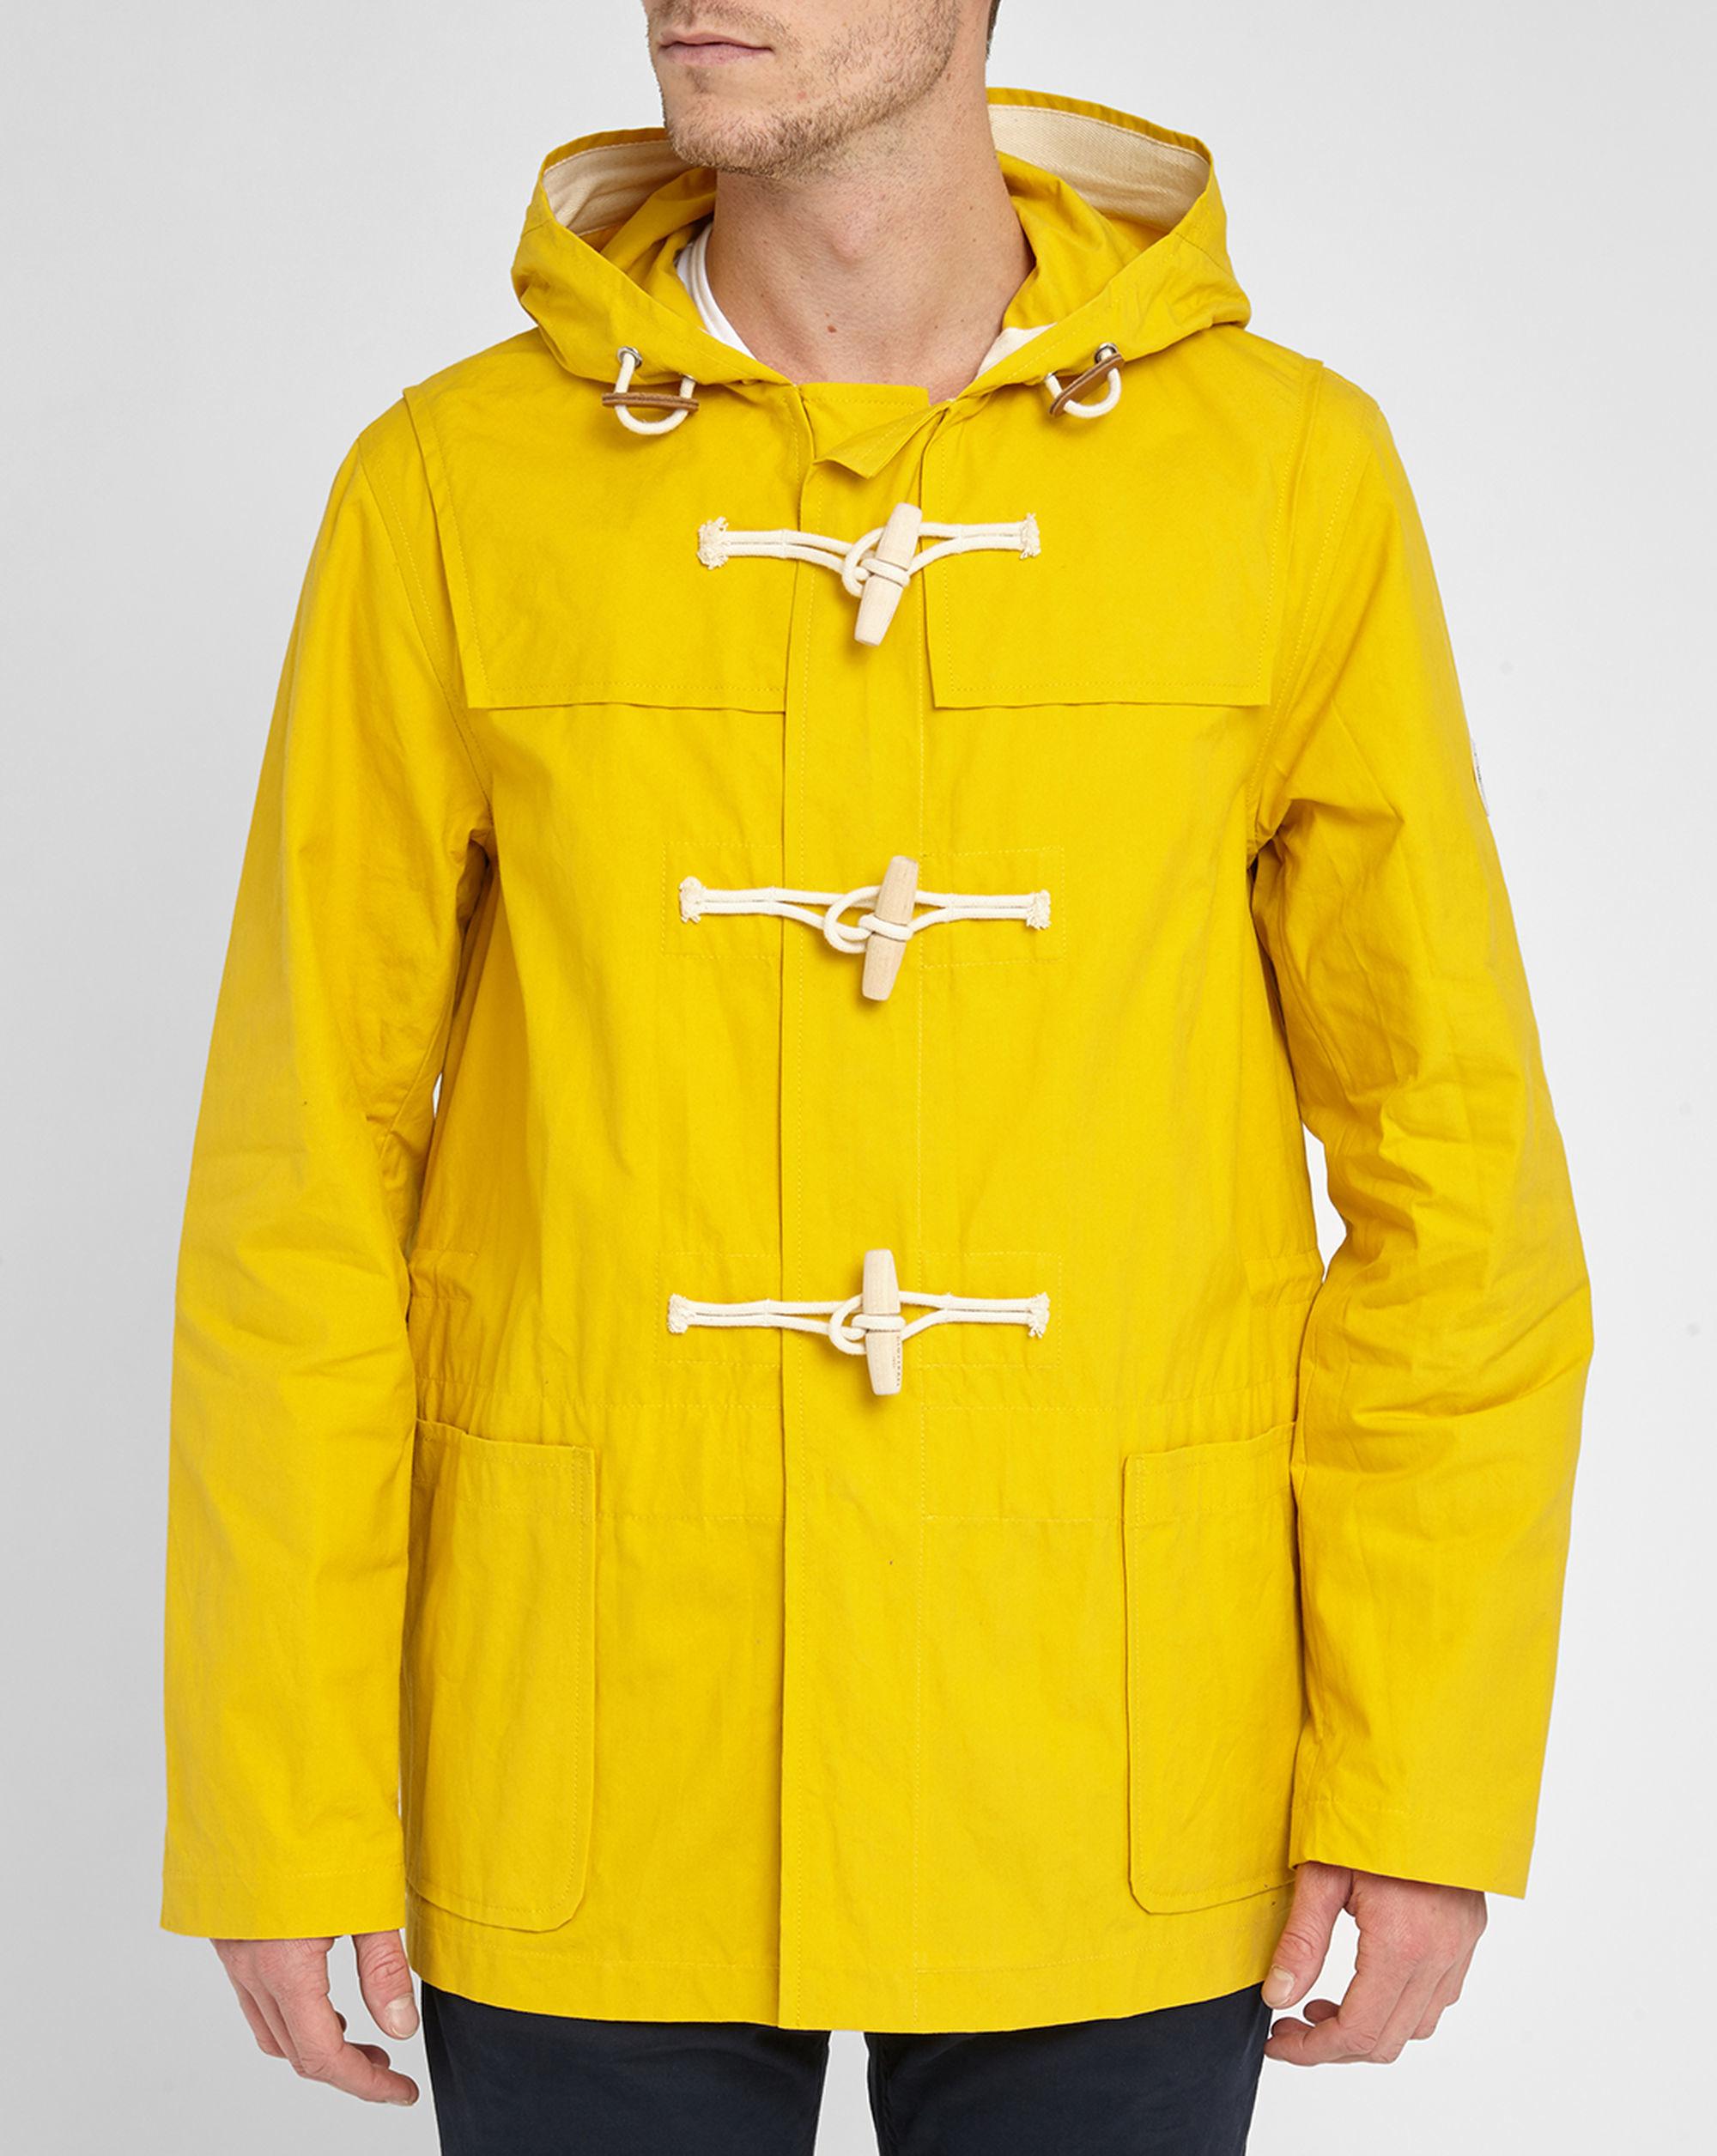 Are Duffle Coats Waterproof - Coat Nj